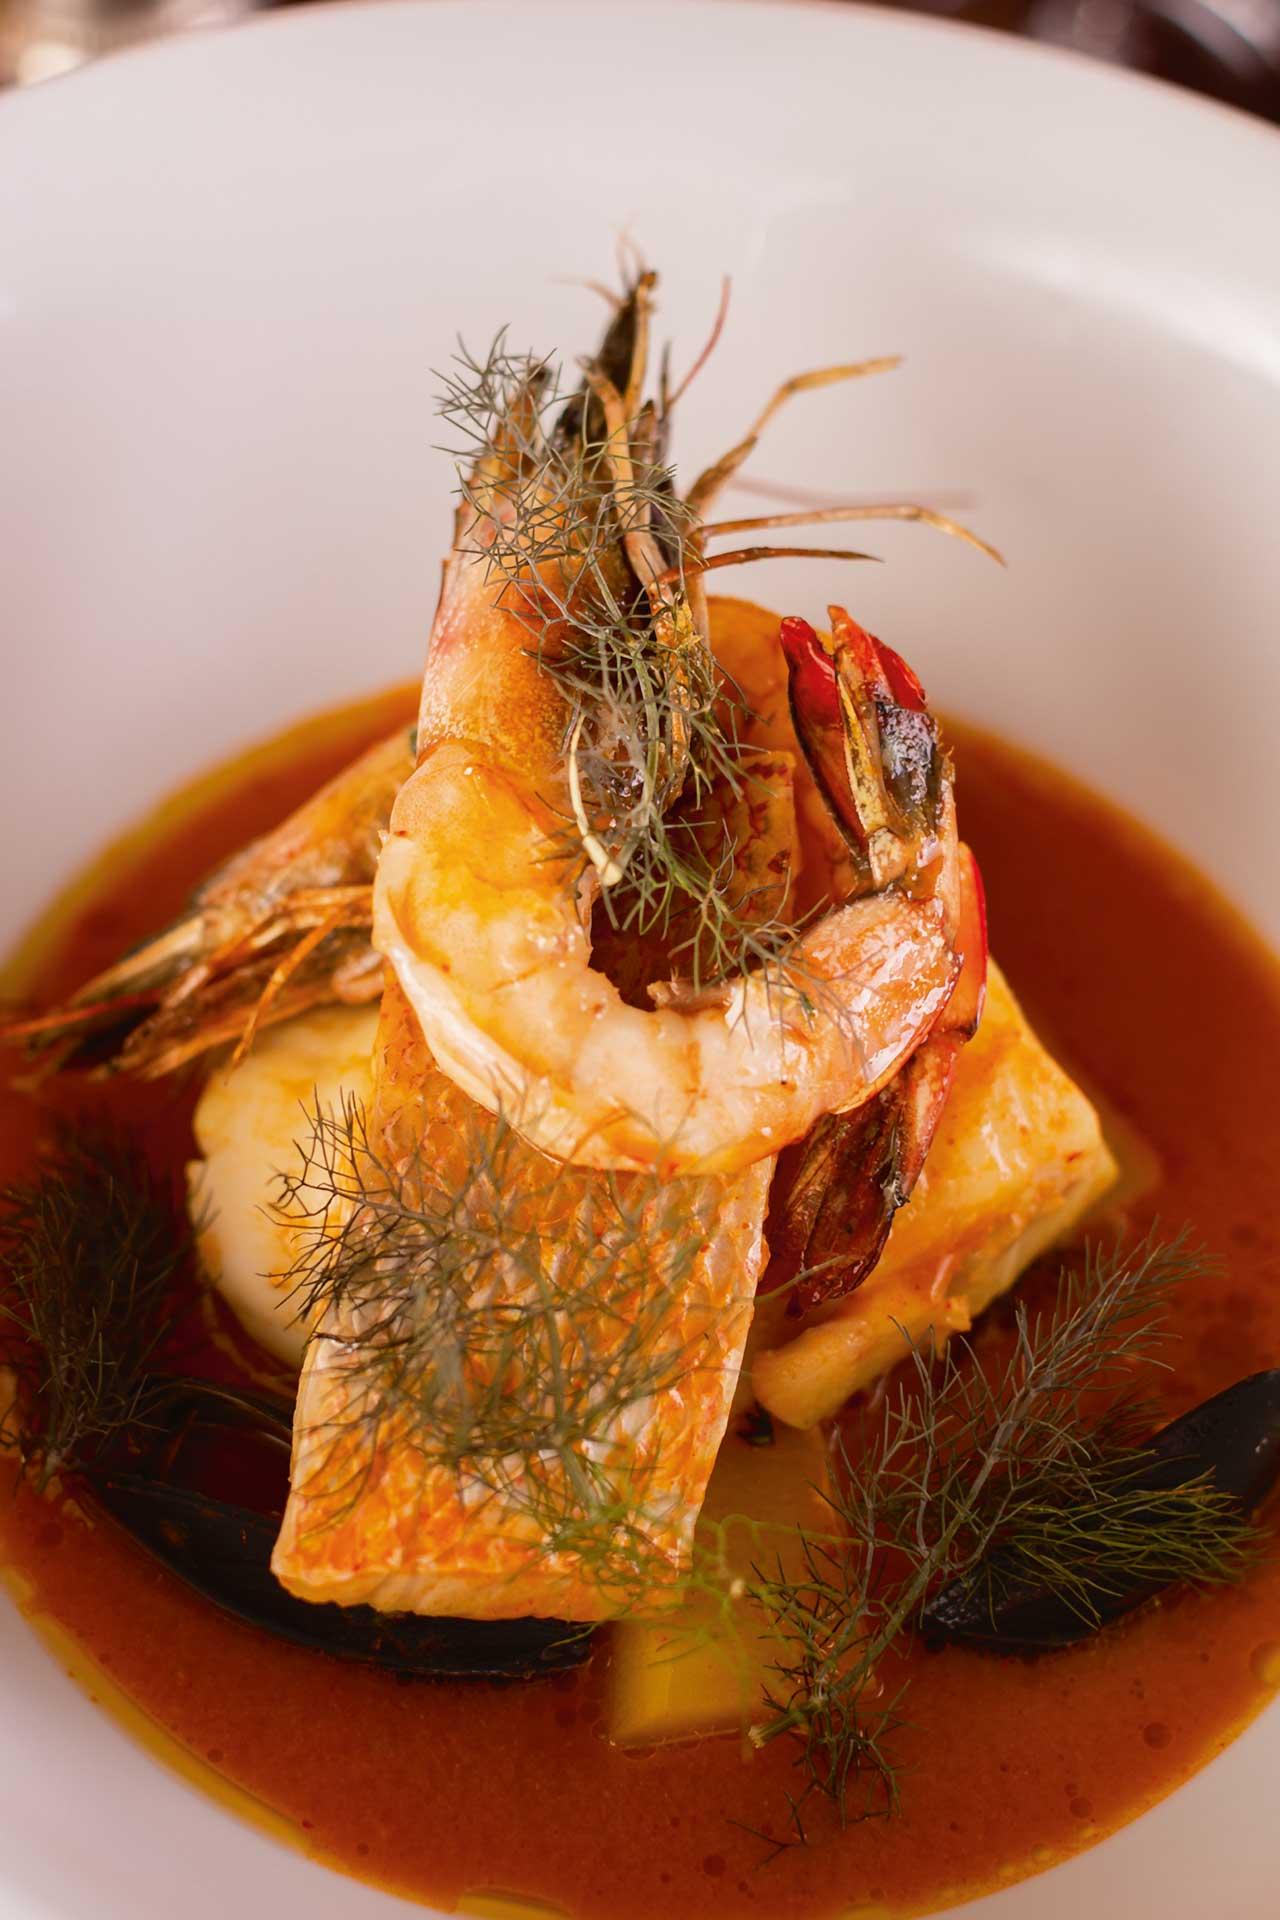 Bouillabaisse Tetou is one of Cathédrale's signature dishes